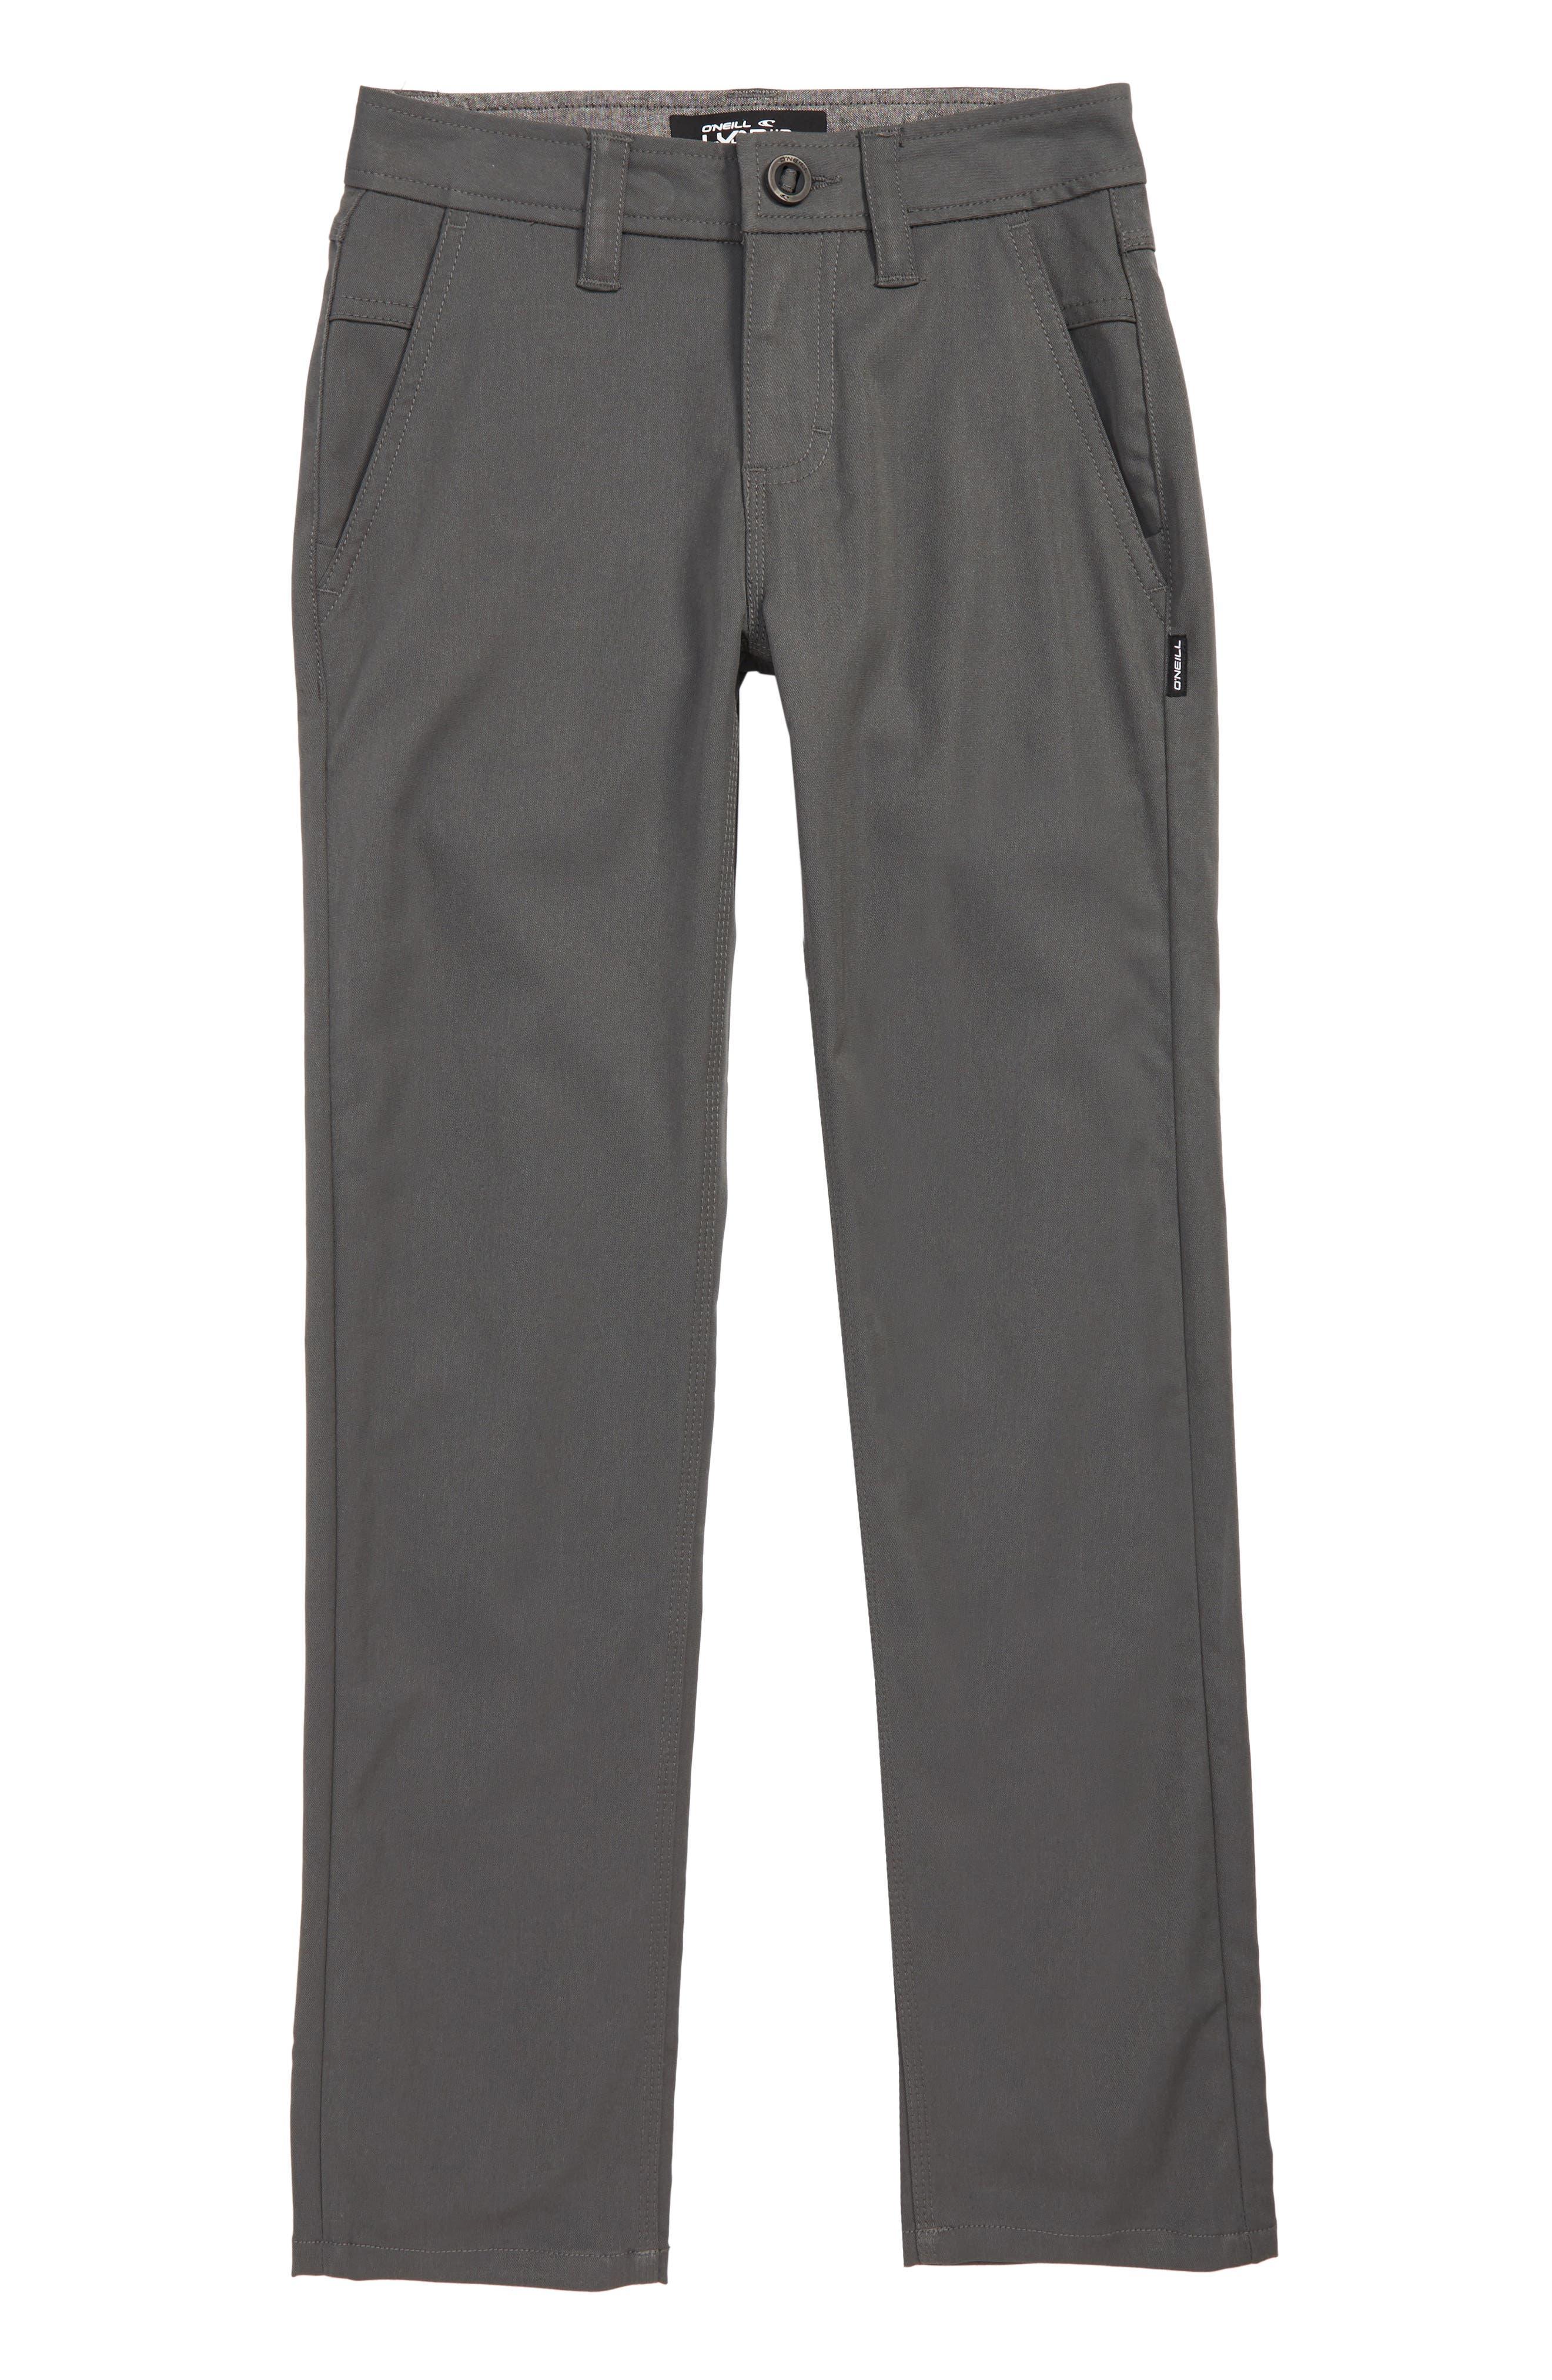 Redlands Hybrid Pants,                             Main thumbnail 1, color,                             Dark Fatigue